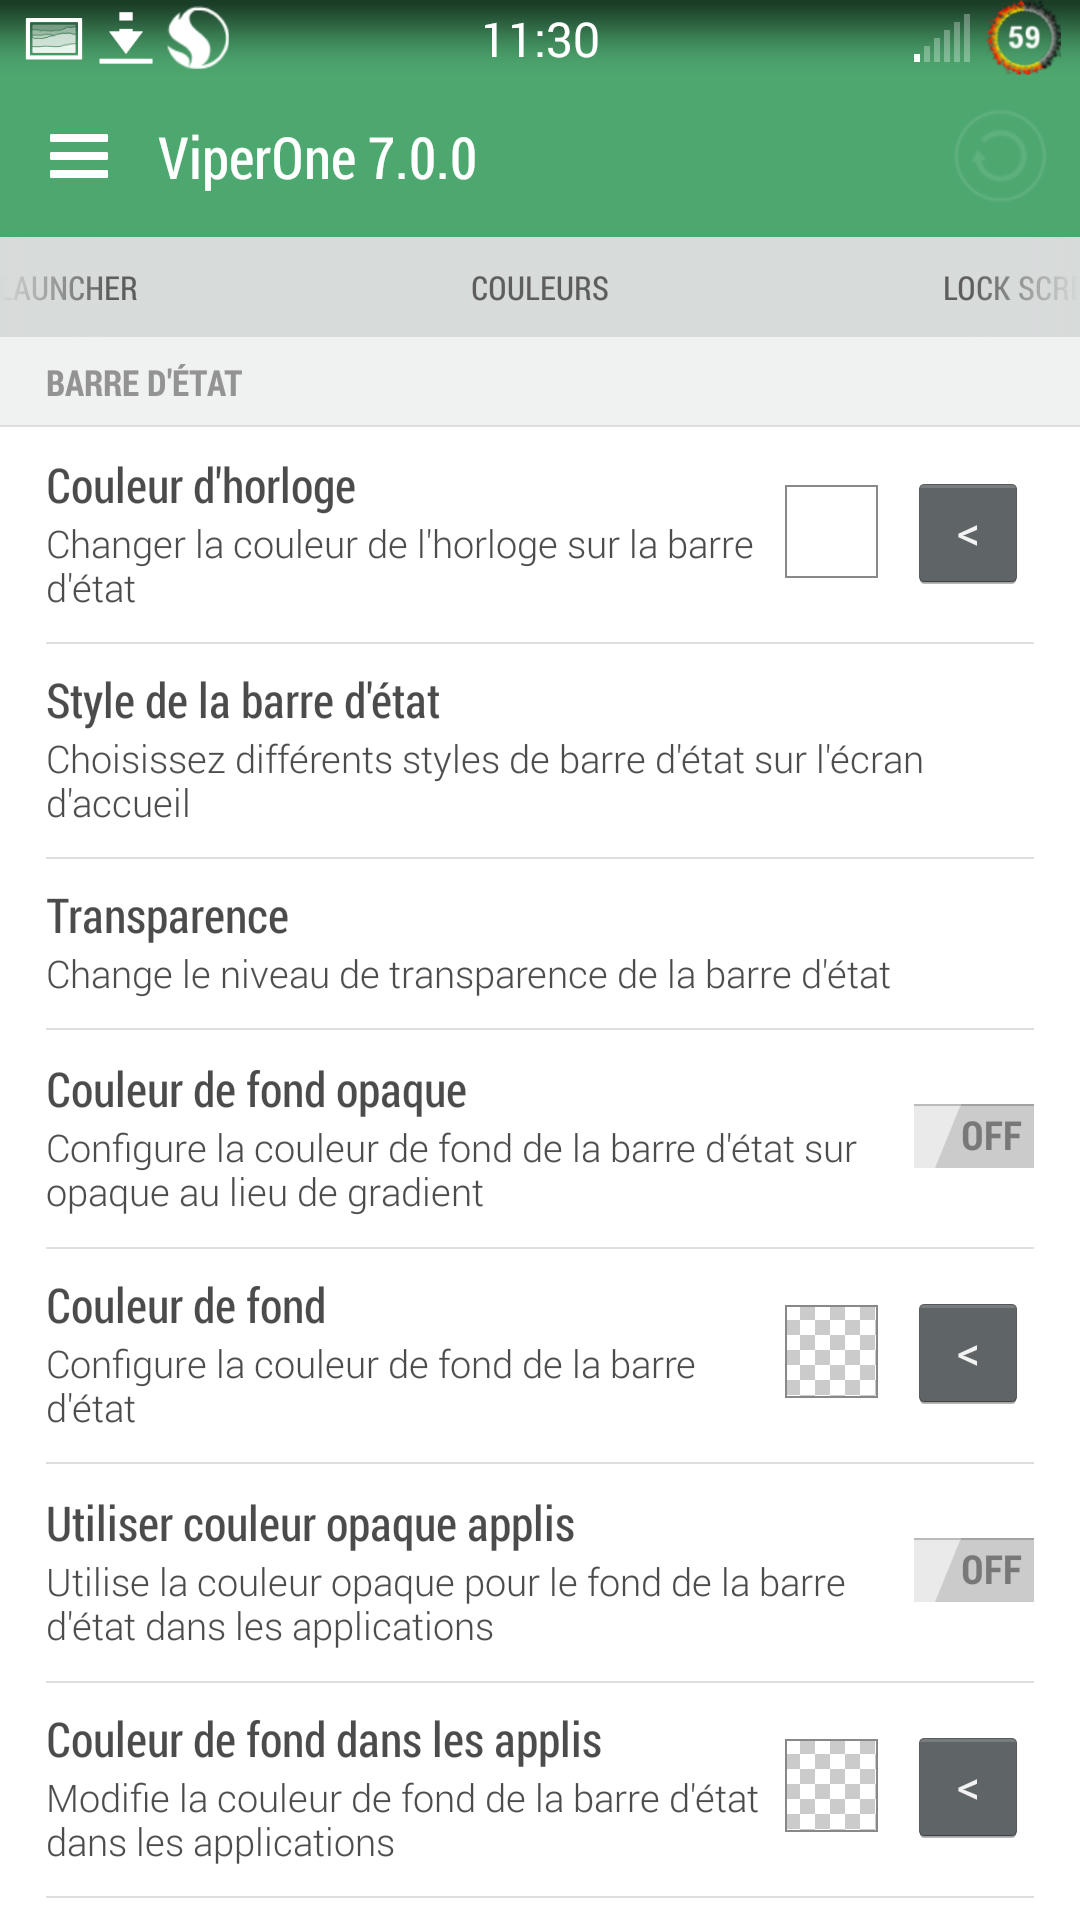 [MOD HTC U11] ViperTrad (version 1.4.0_1.0_U11) Uoptn3b7e5ha4fcfg